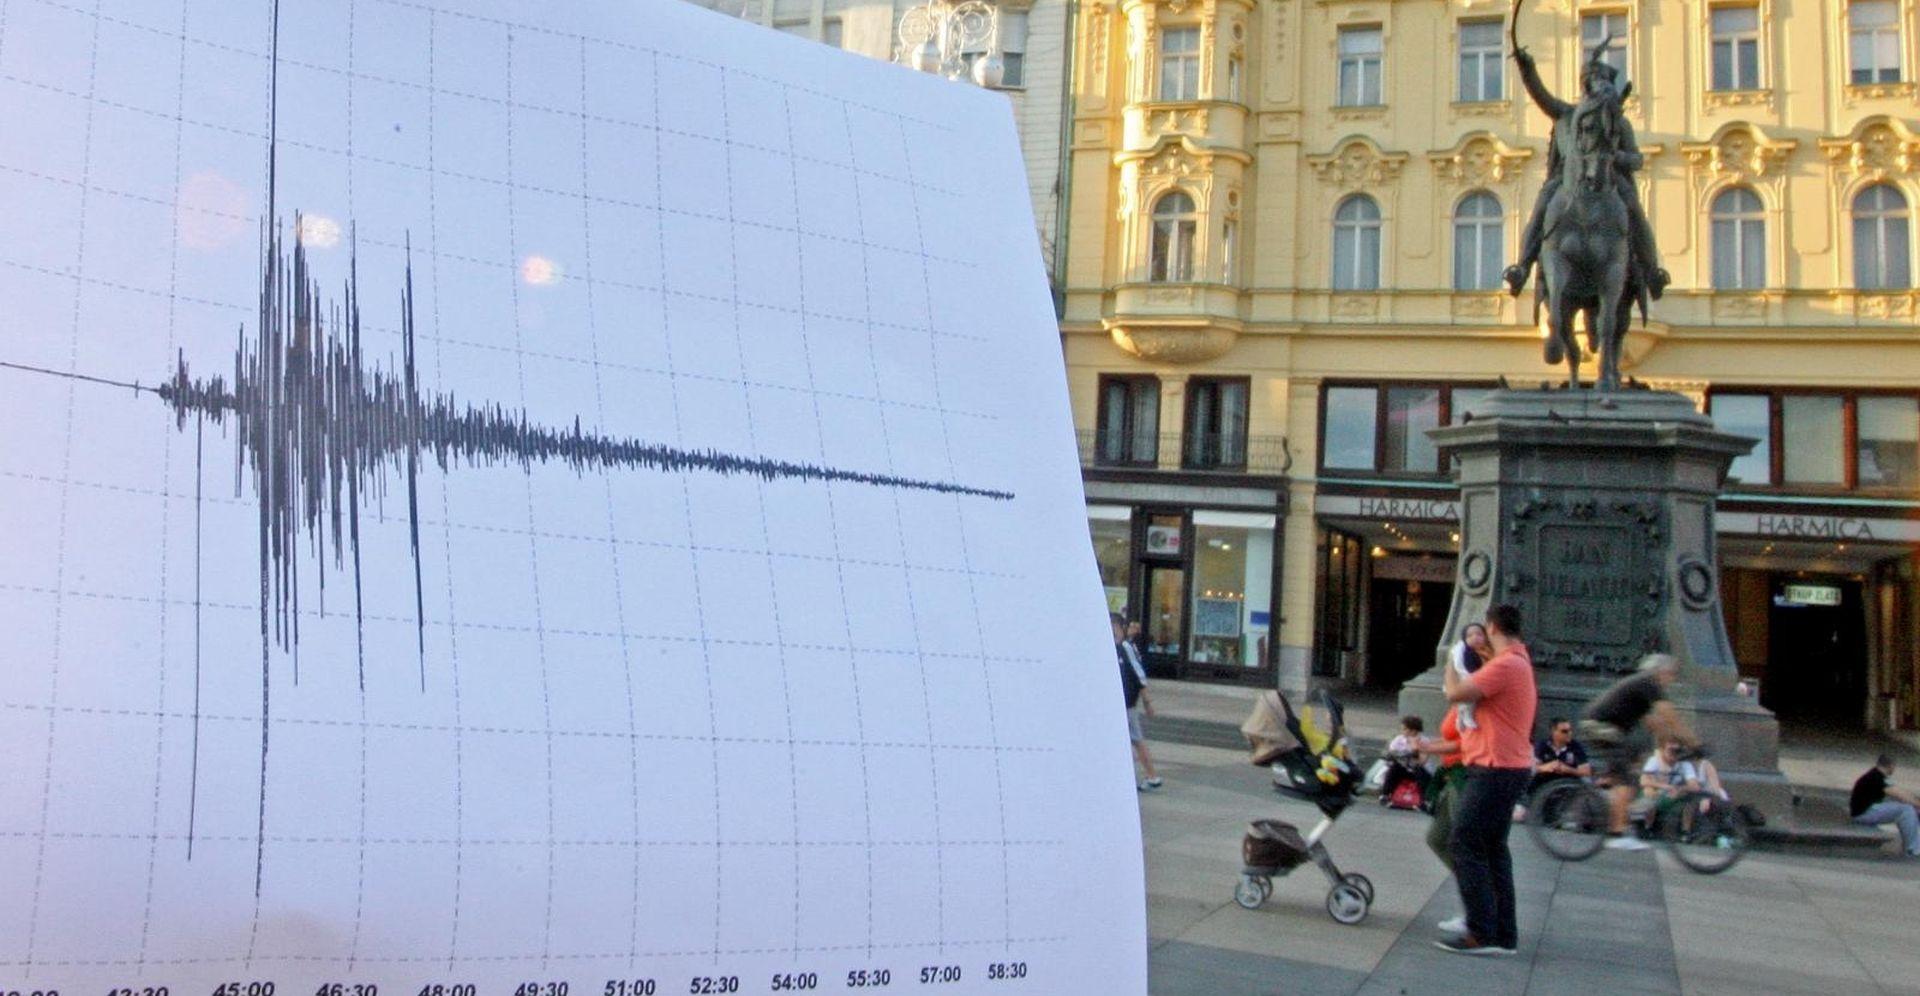 Novi potres kod Zagreba, epicentar kod Markovog polja